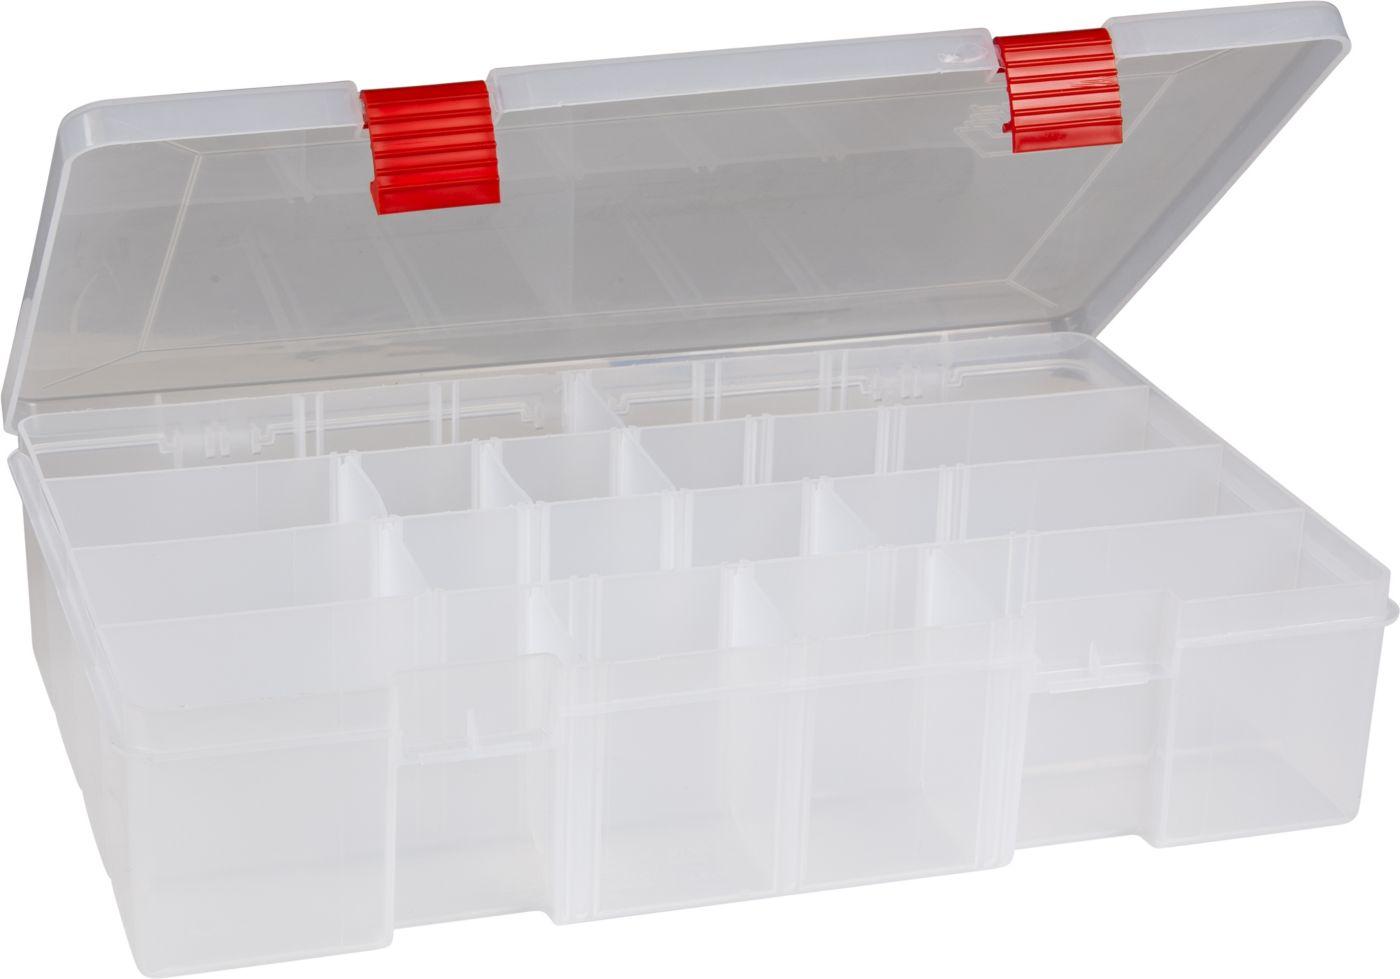 Plano Rustrictor 3700 Deep Utility Box